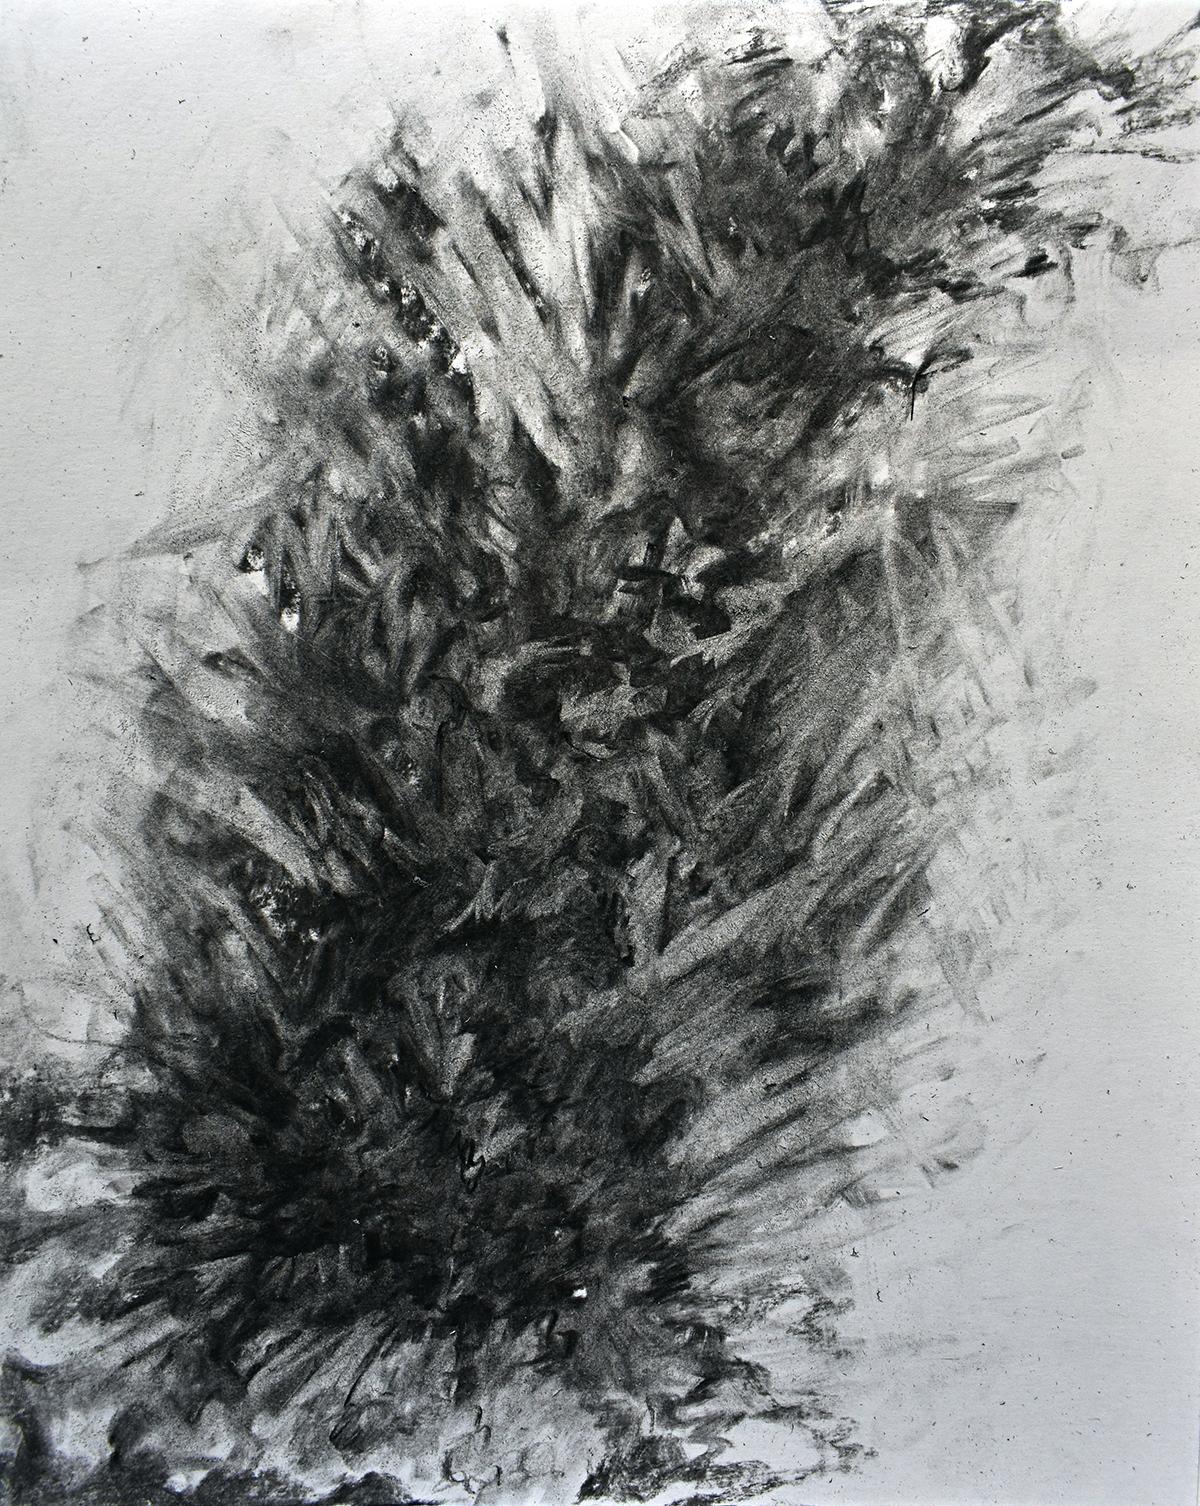 Surfaces Demarcations (Gravel II), 2018